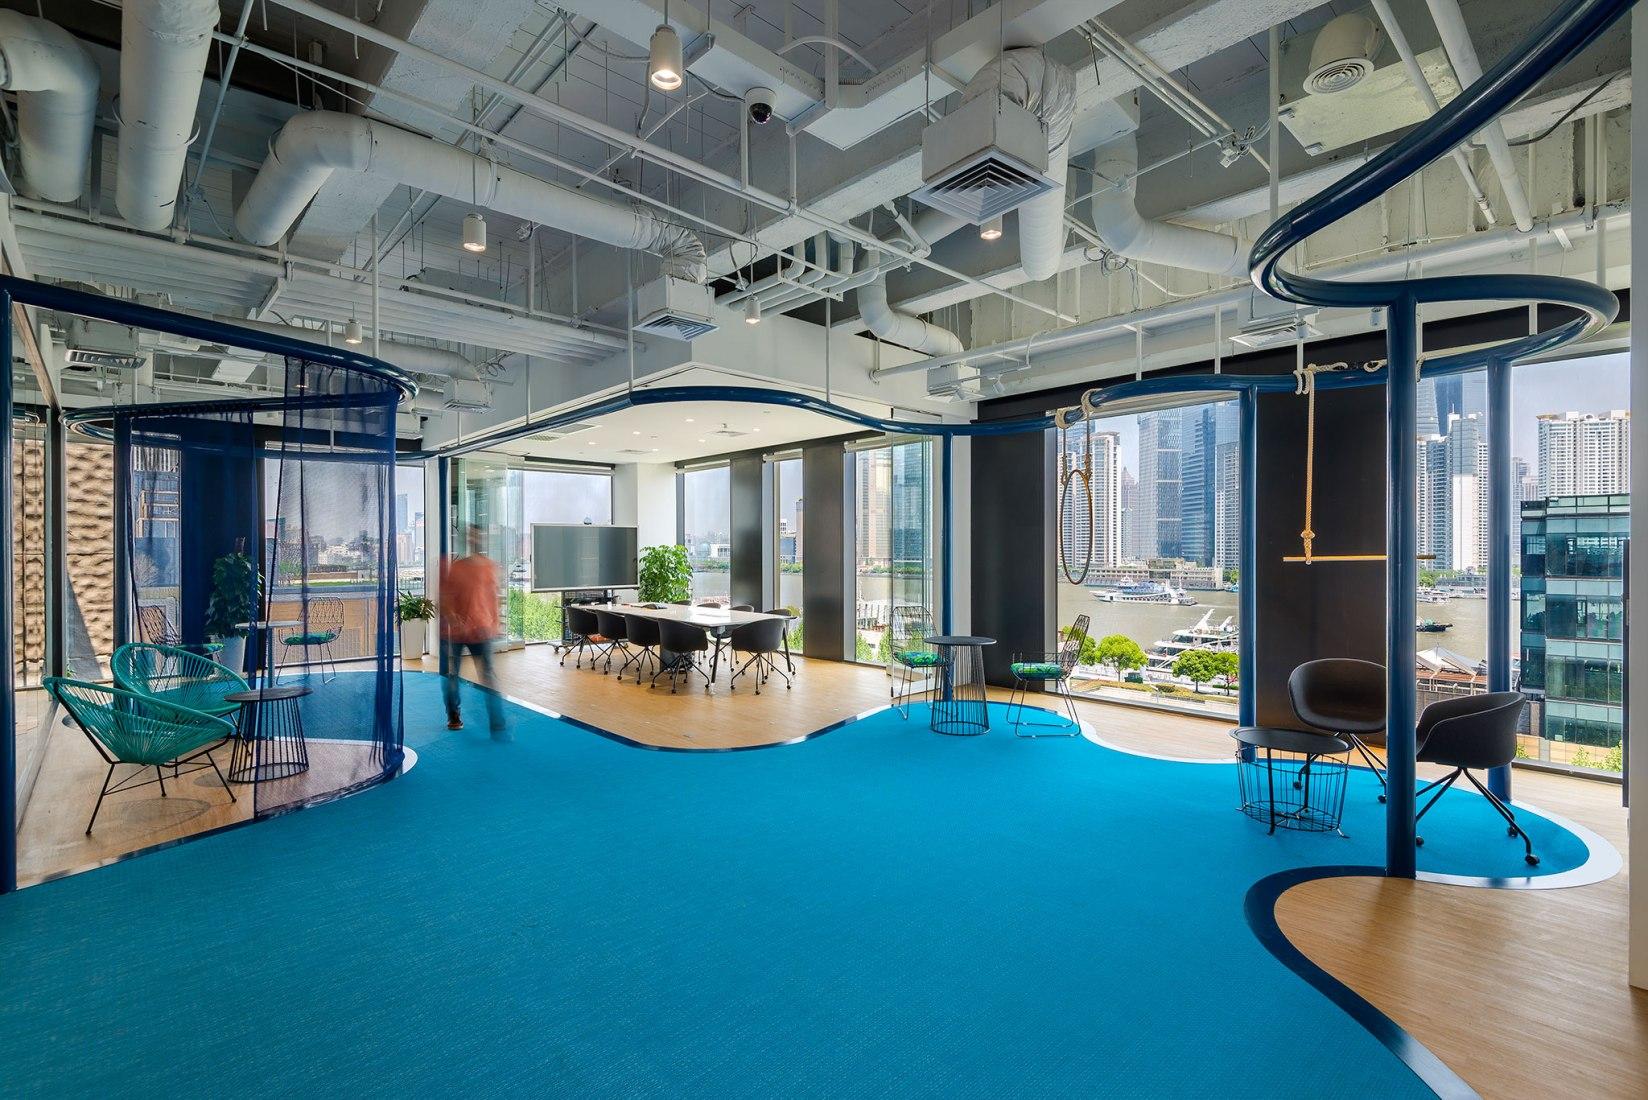 Club Med Office in Shanghai by 100architects. Photograph © Amey Kandalgaonkar Photography